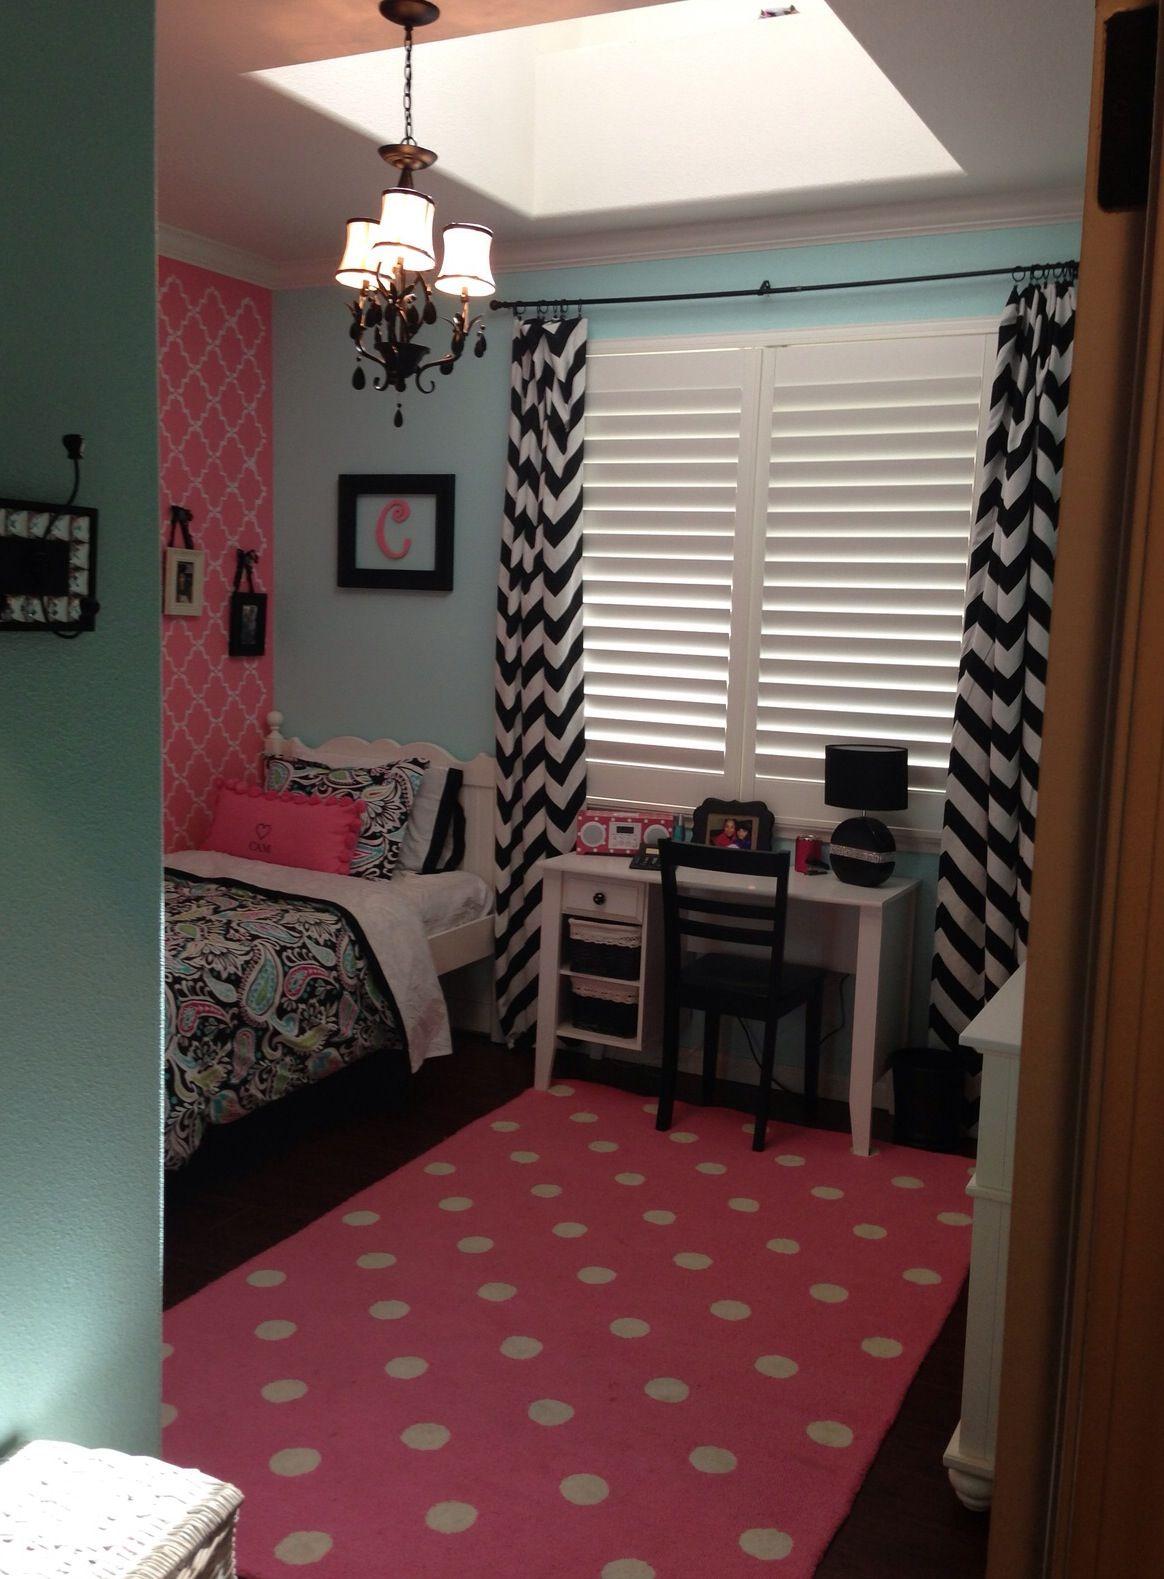 Bed beside window ideas  pretty girl room chevron and polka dots  big girlz room